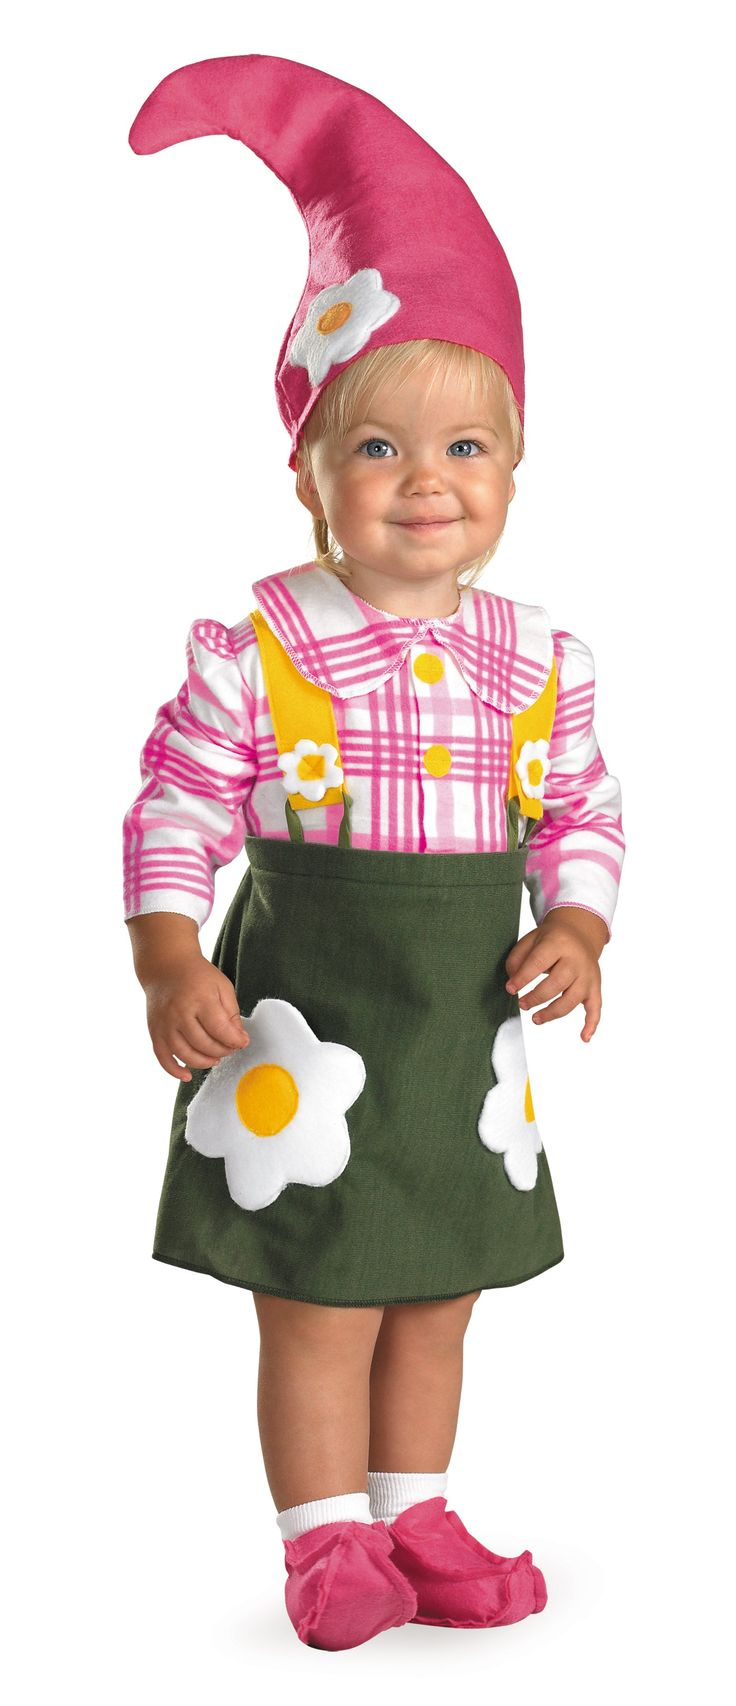 62 best images about J & E Costume Ideas on Pinterest | Garden ...